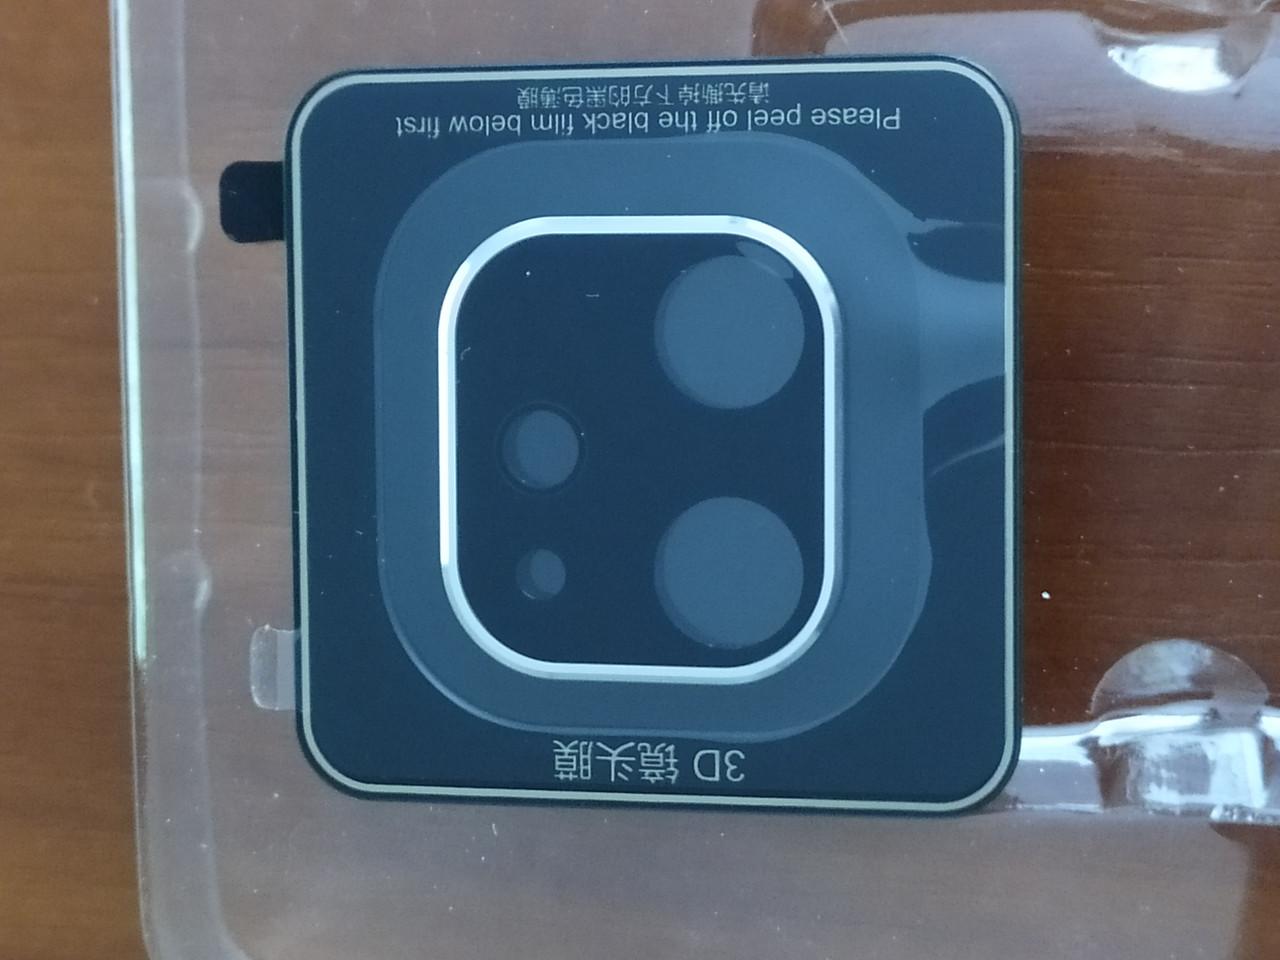 Захисне скло на камеру HOCO 3D Metal for iPhone 11 (срібло)